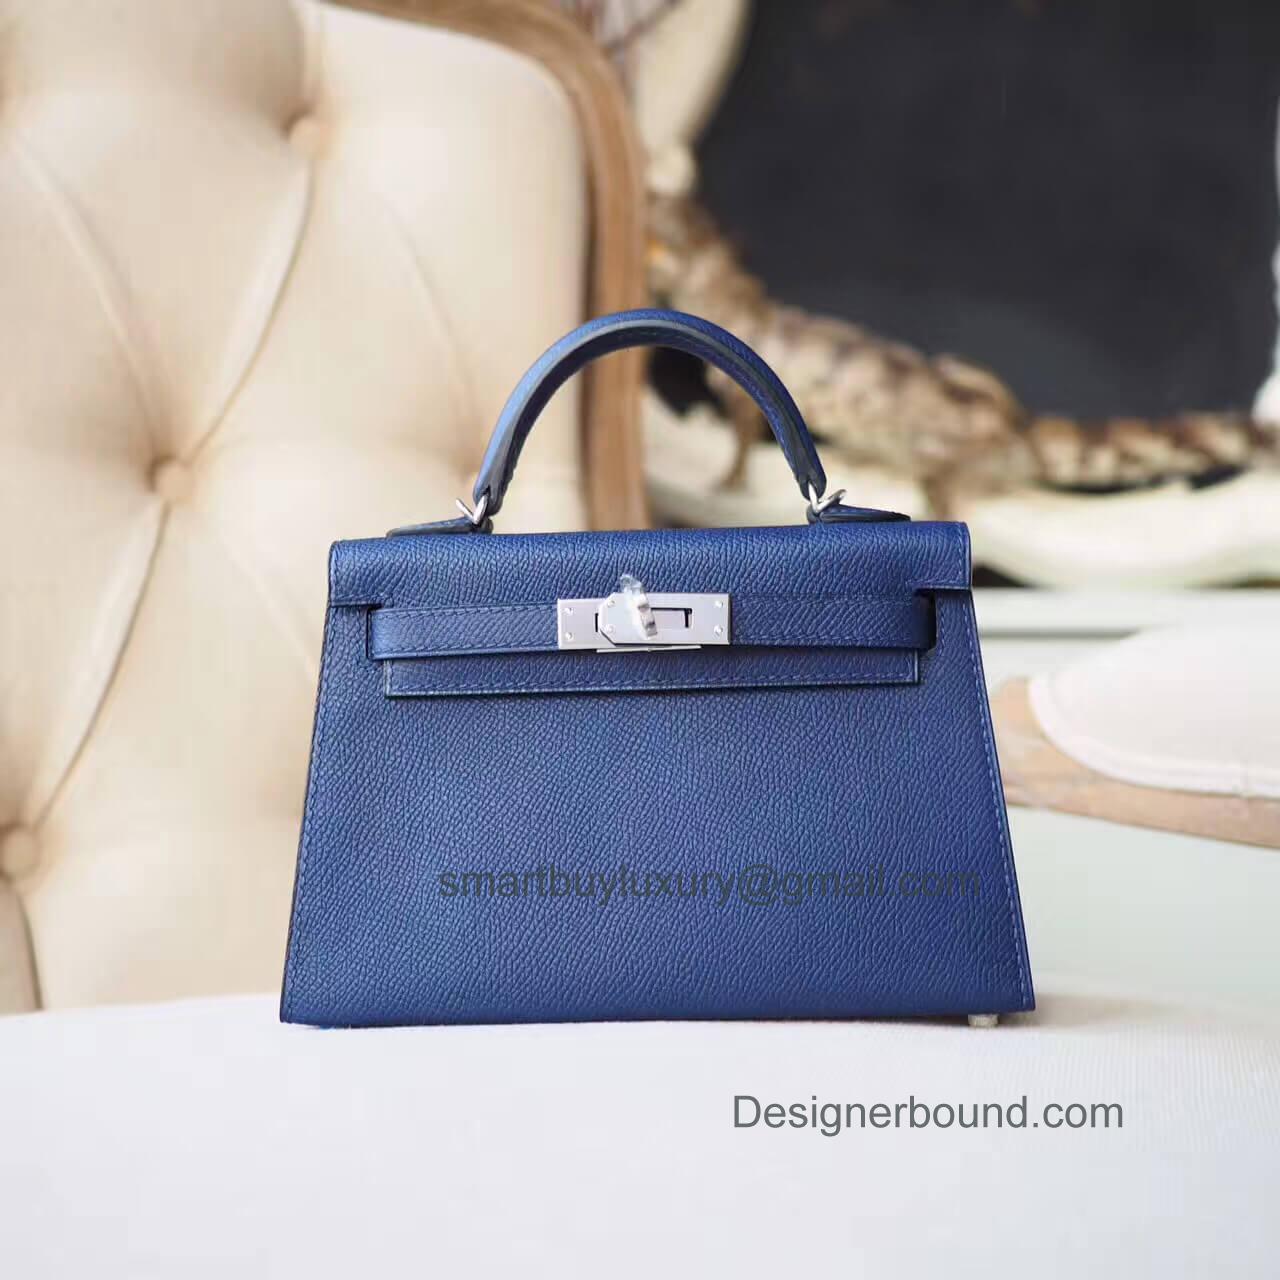 66d7c5052cf Hermes Mini Kelly II Bag in ck73 Blue Saphir Epsom PHW